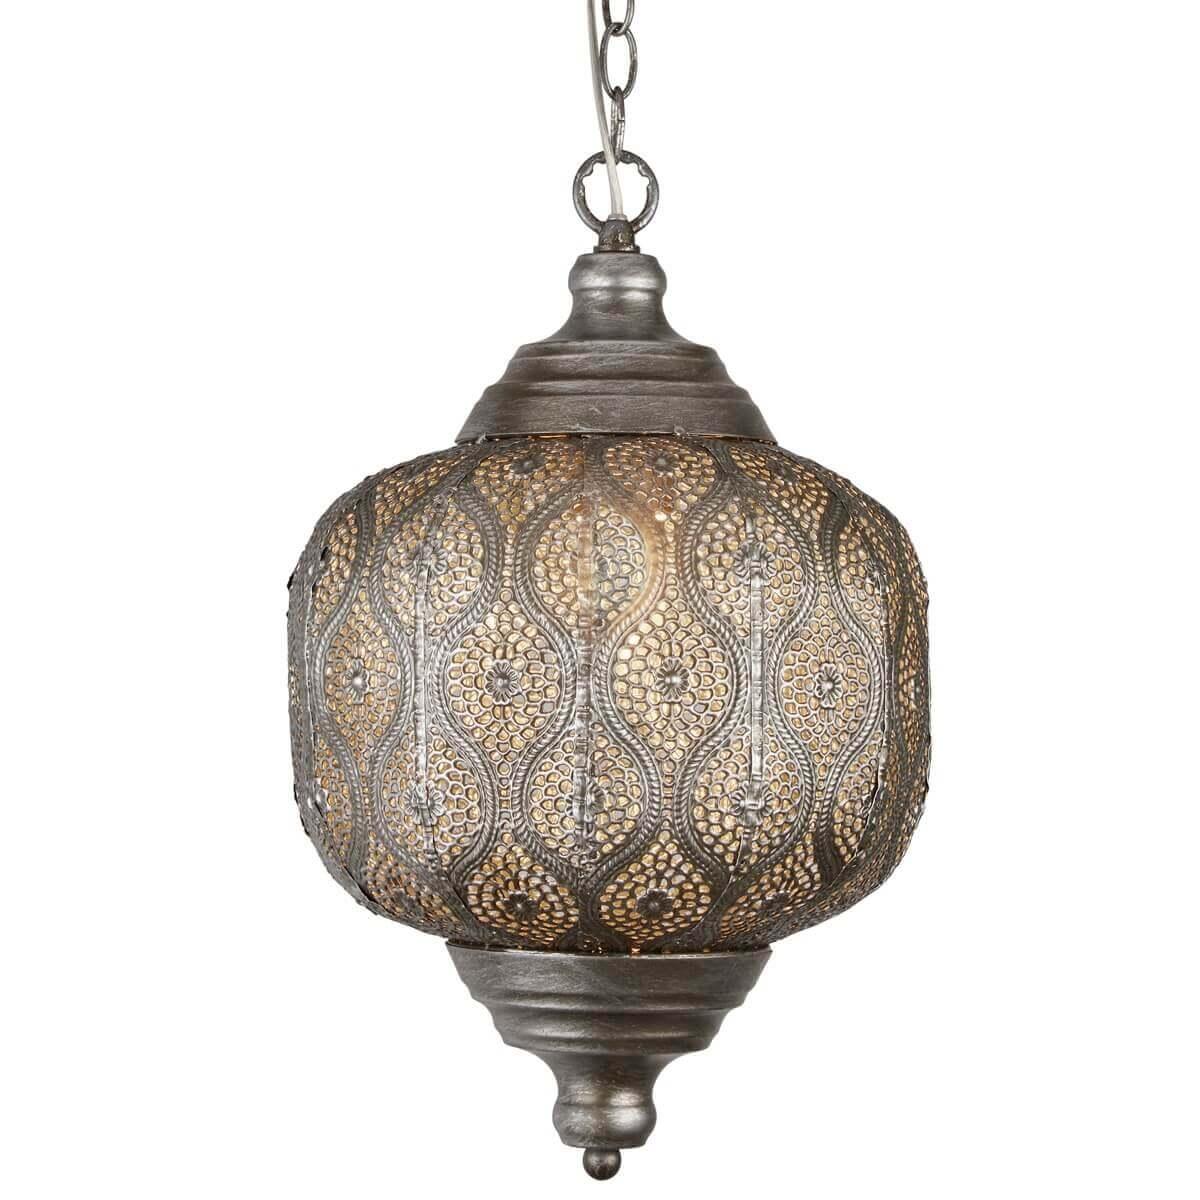 Moroccan 1 Light Pendant Antique Silver Ledlam Lighting